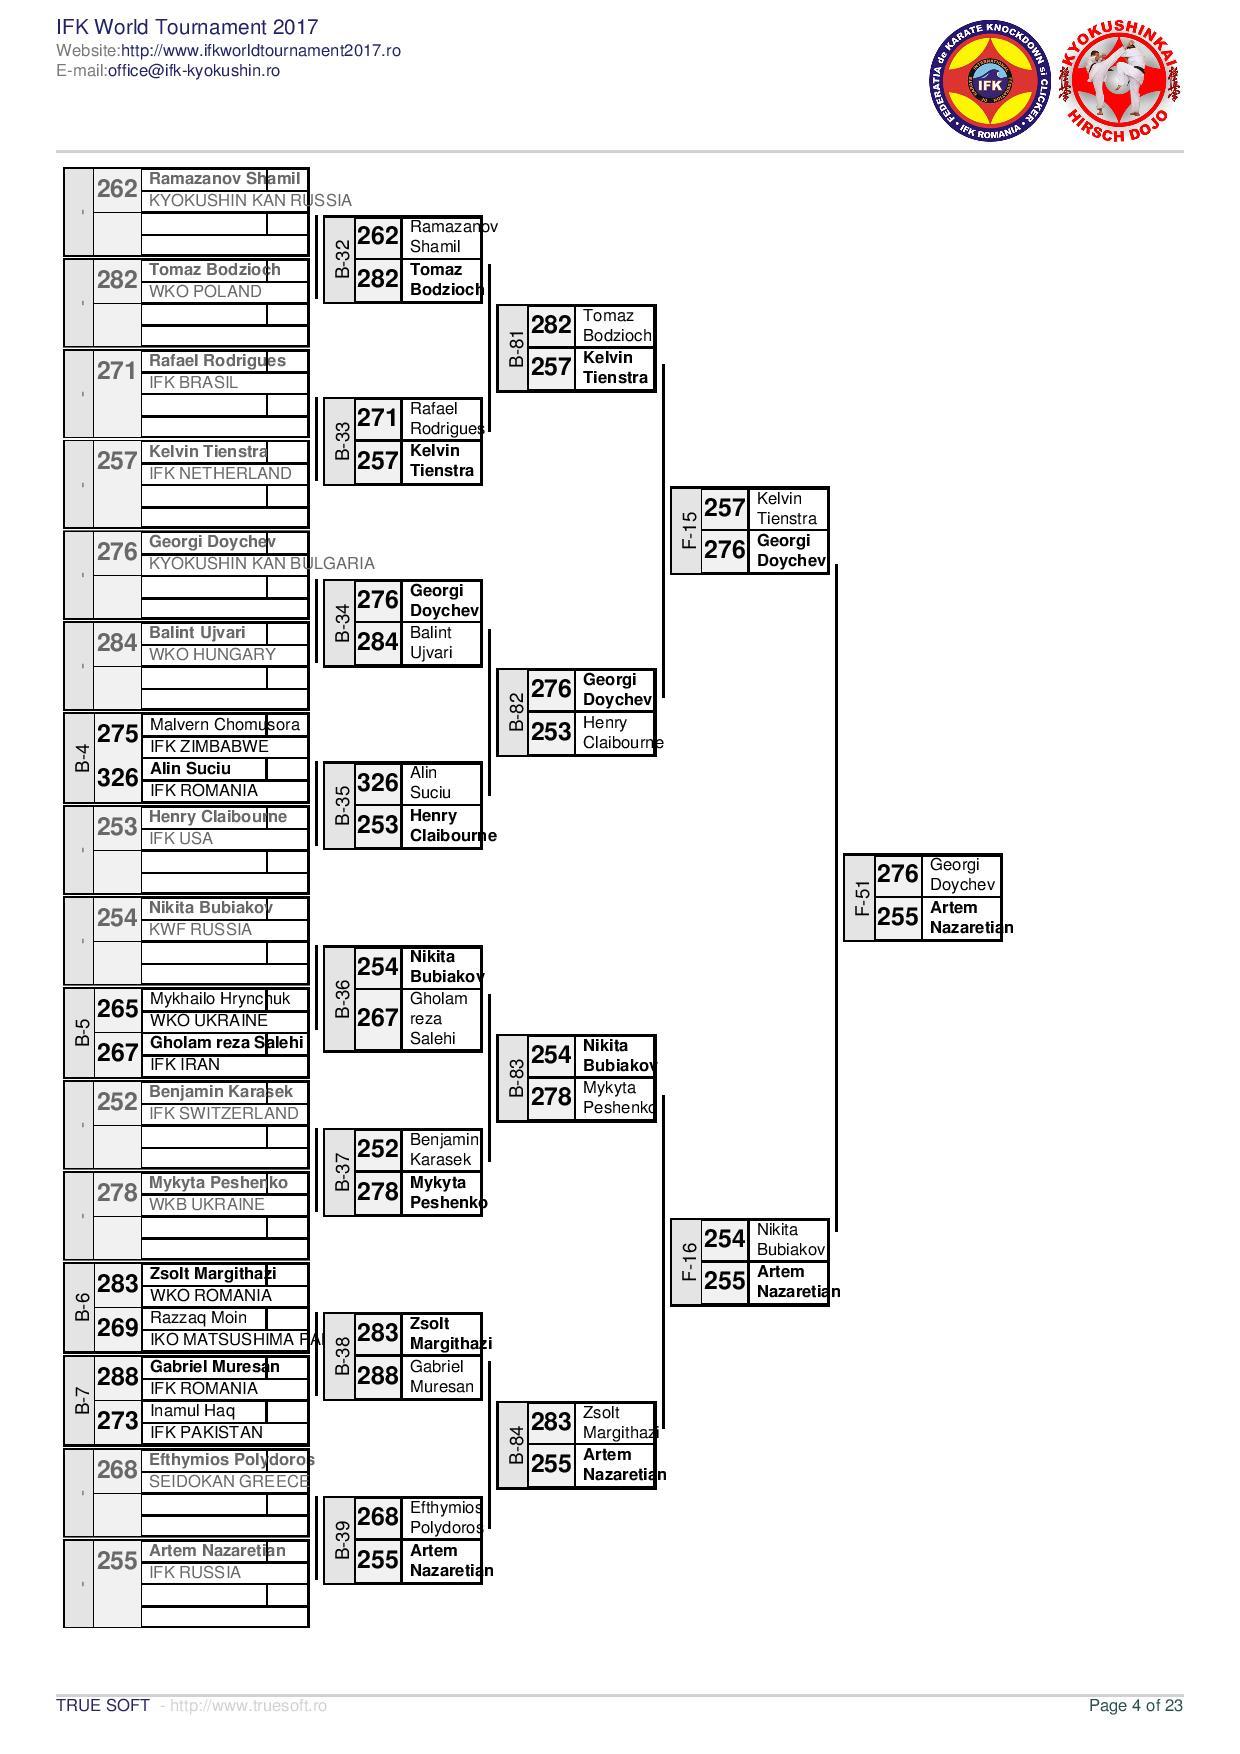 IFK World Tournament 2017 - Final   results-page-004.jpg